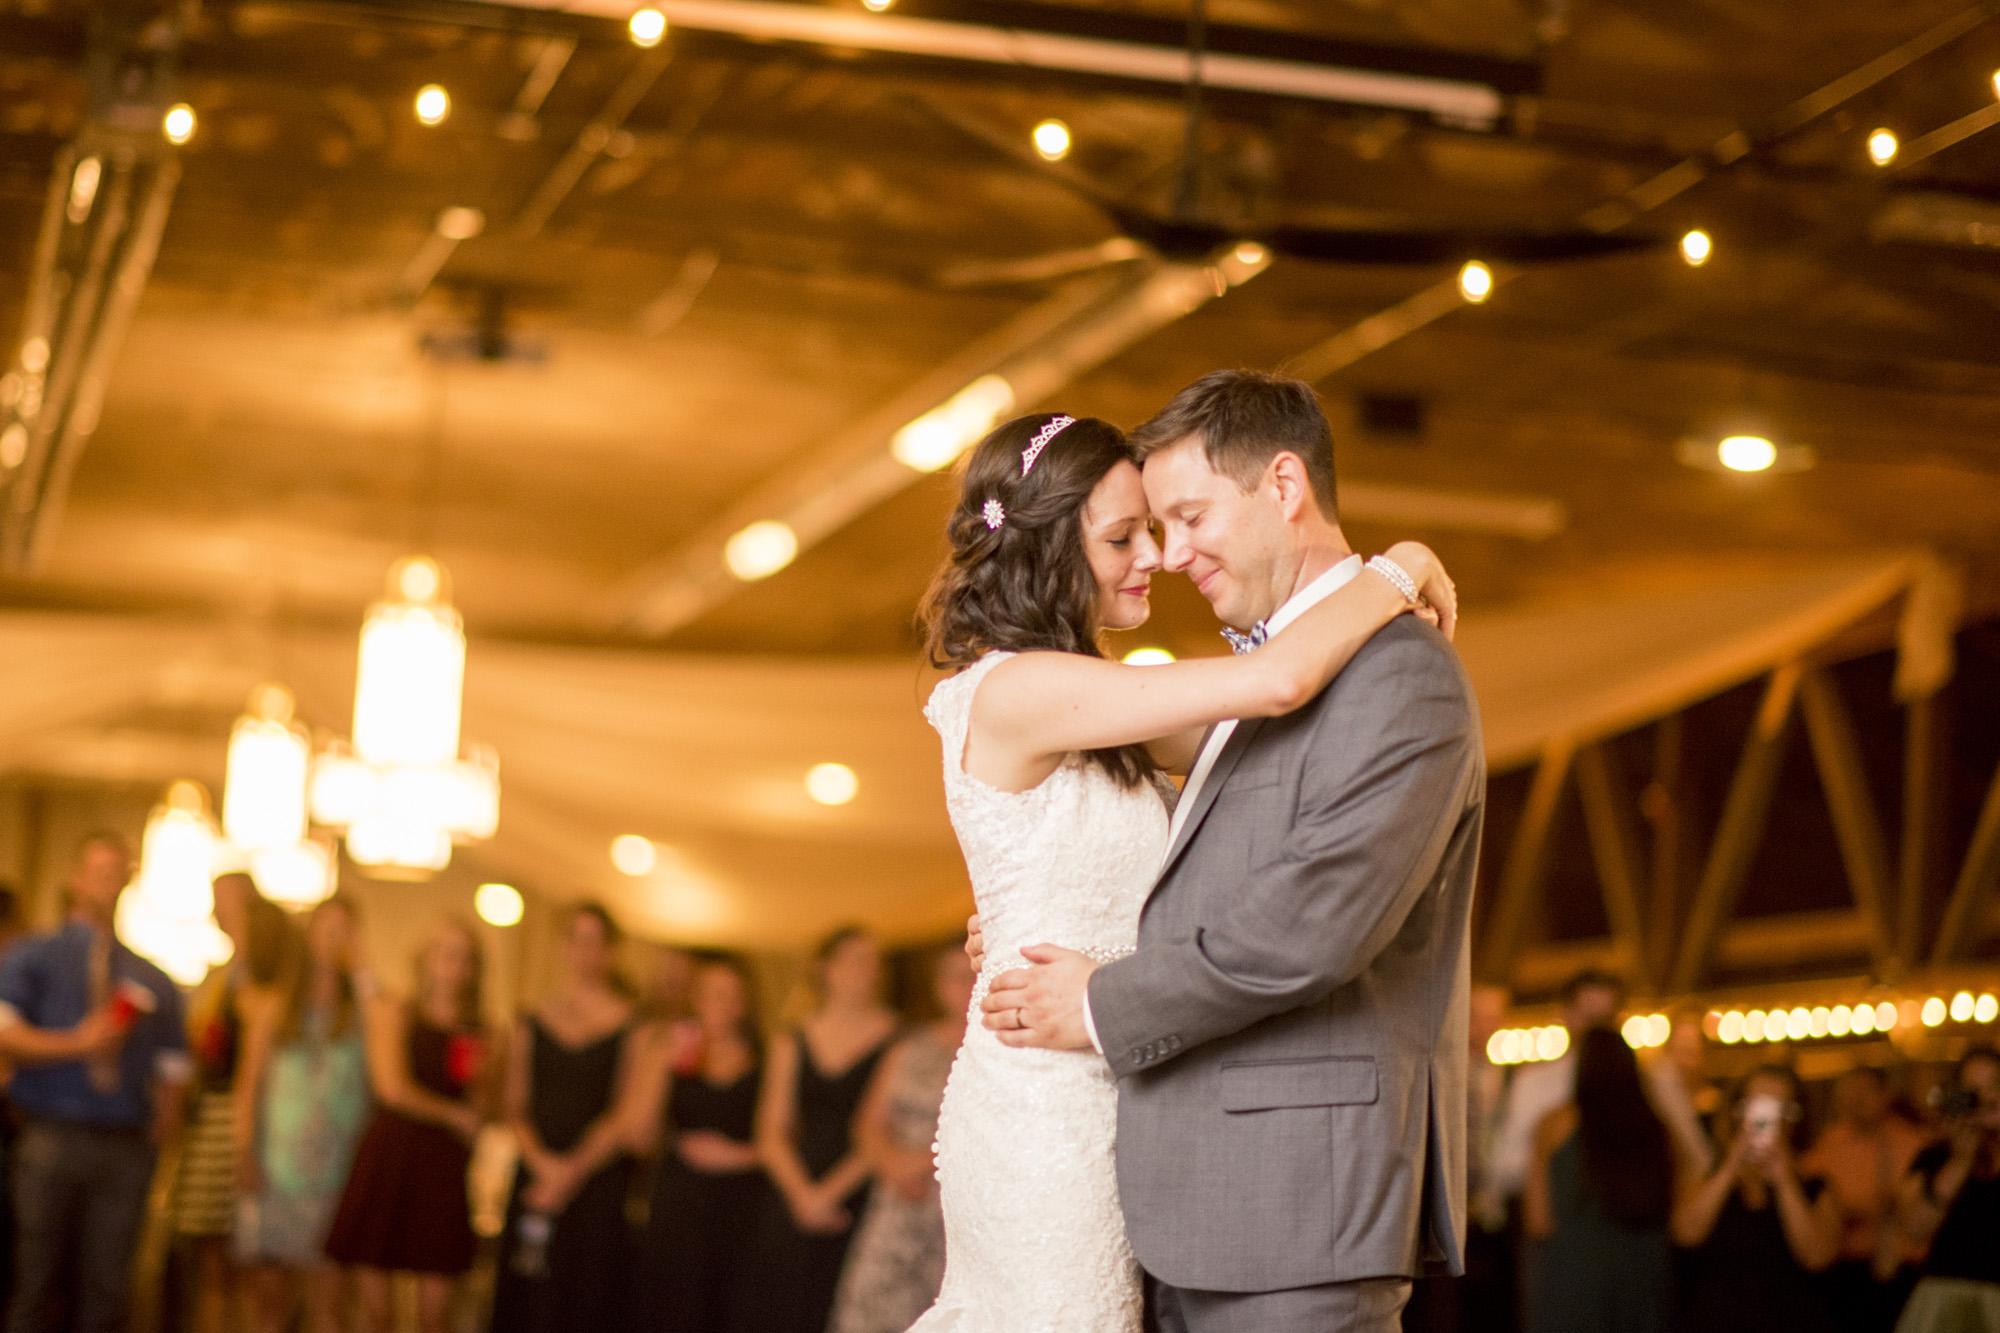 Seriously_Sabrina_Photography_Bowling_Green_Kentucky_Highland_Stables_Wedding_Wolff162.jpg